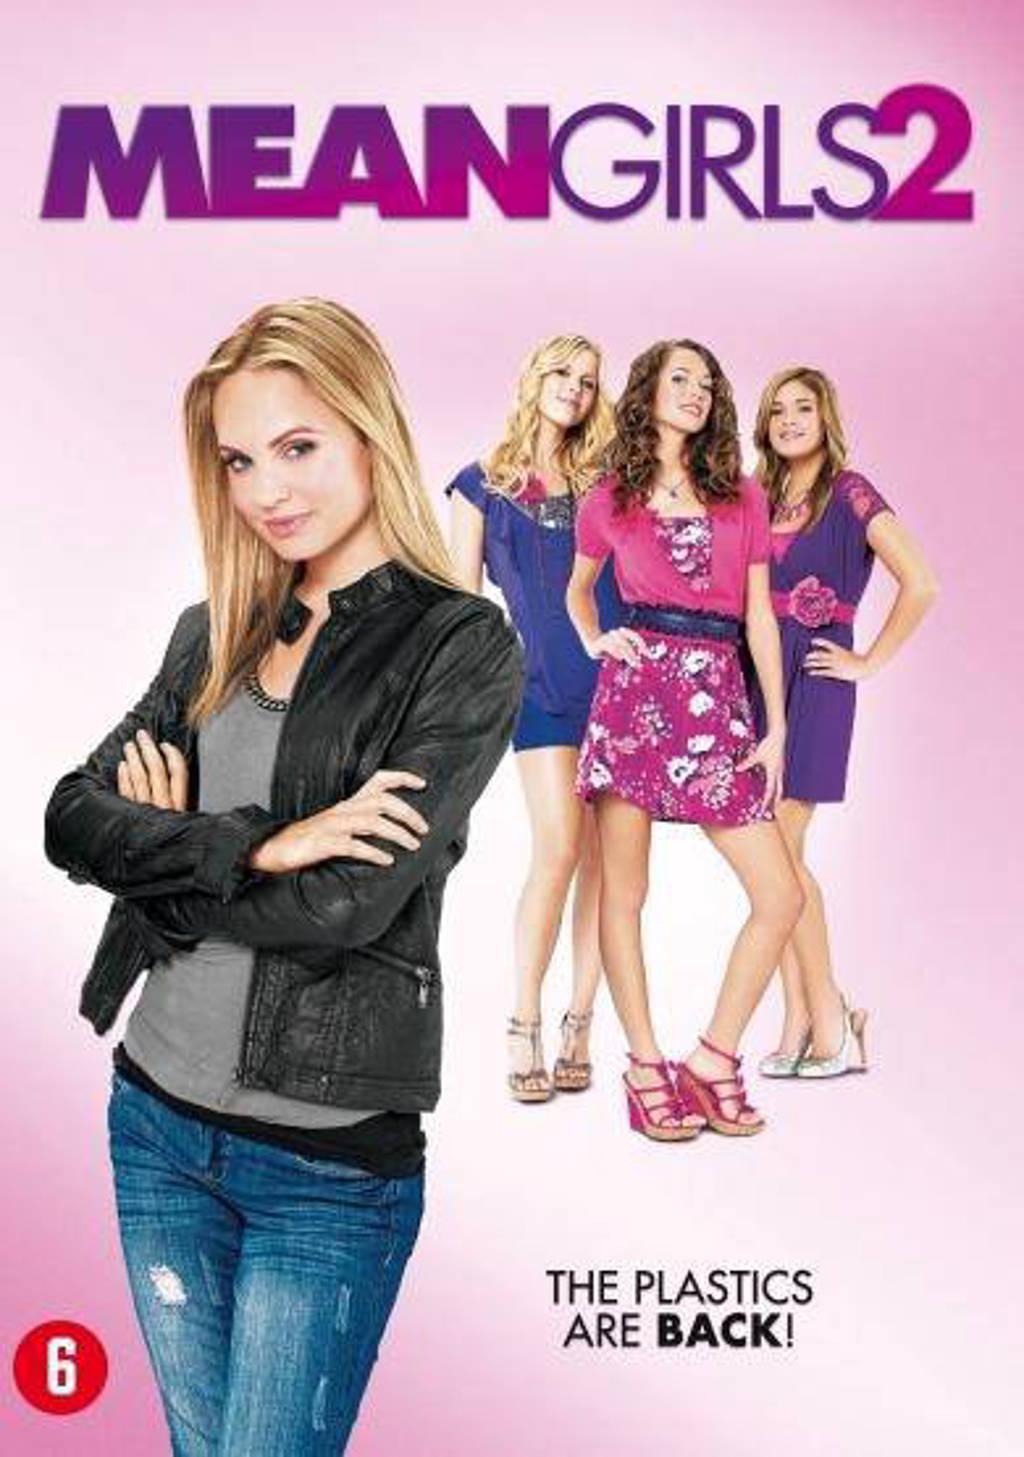 Mean girls 2 (DVD)